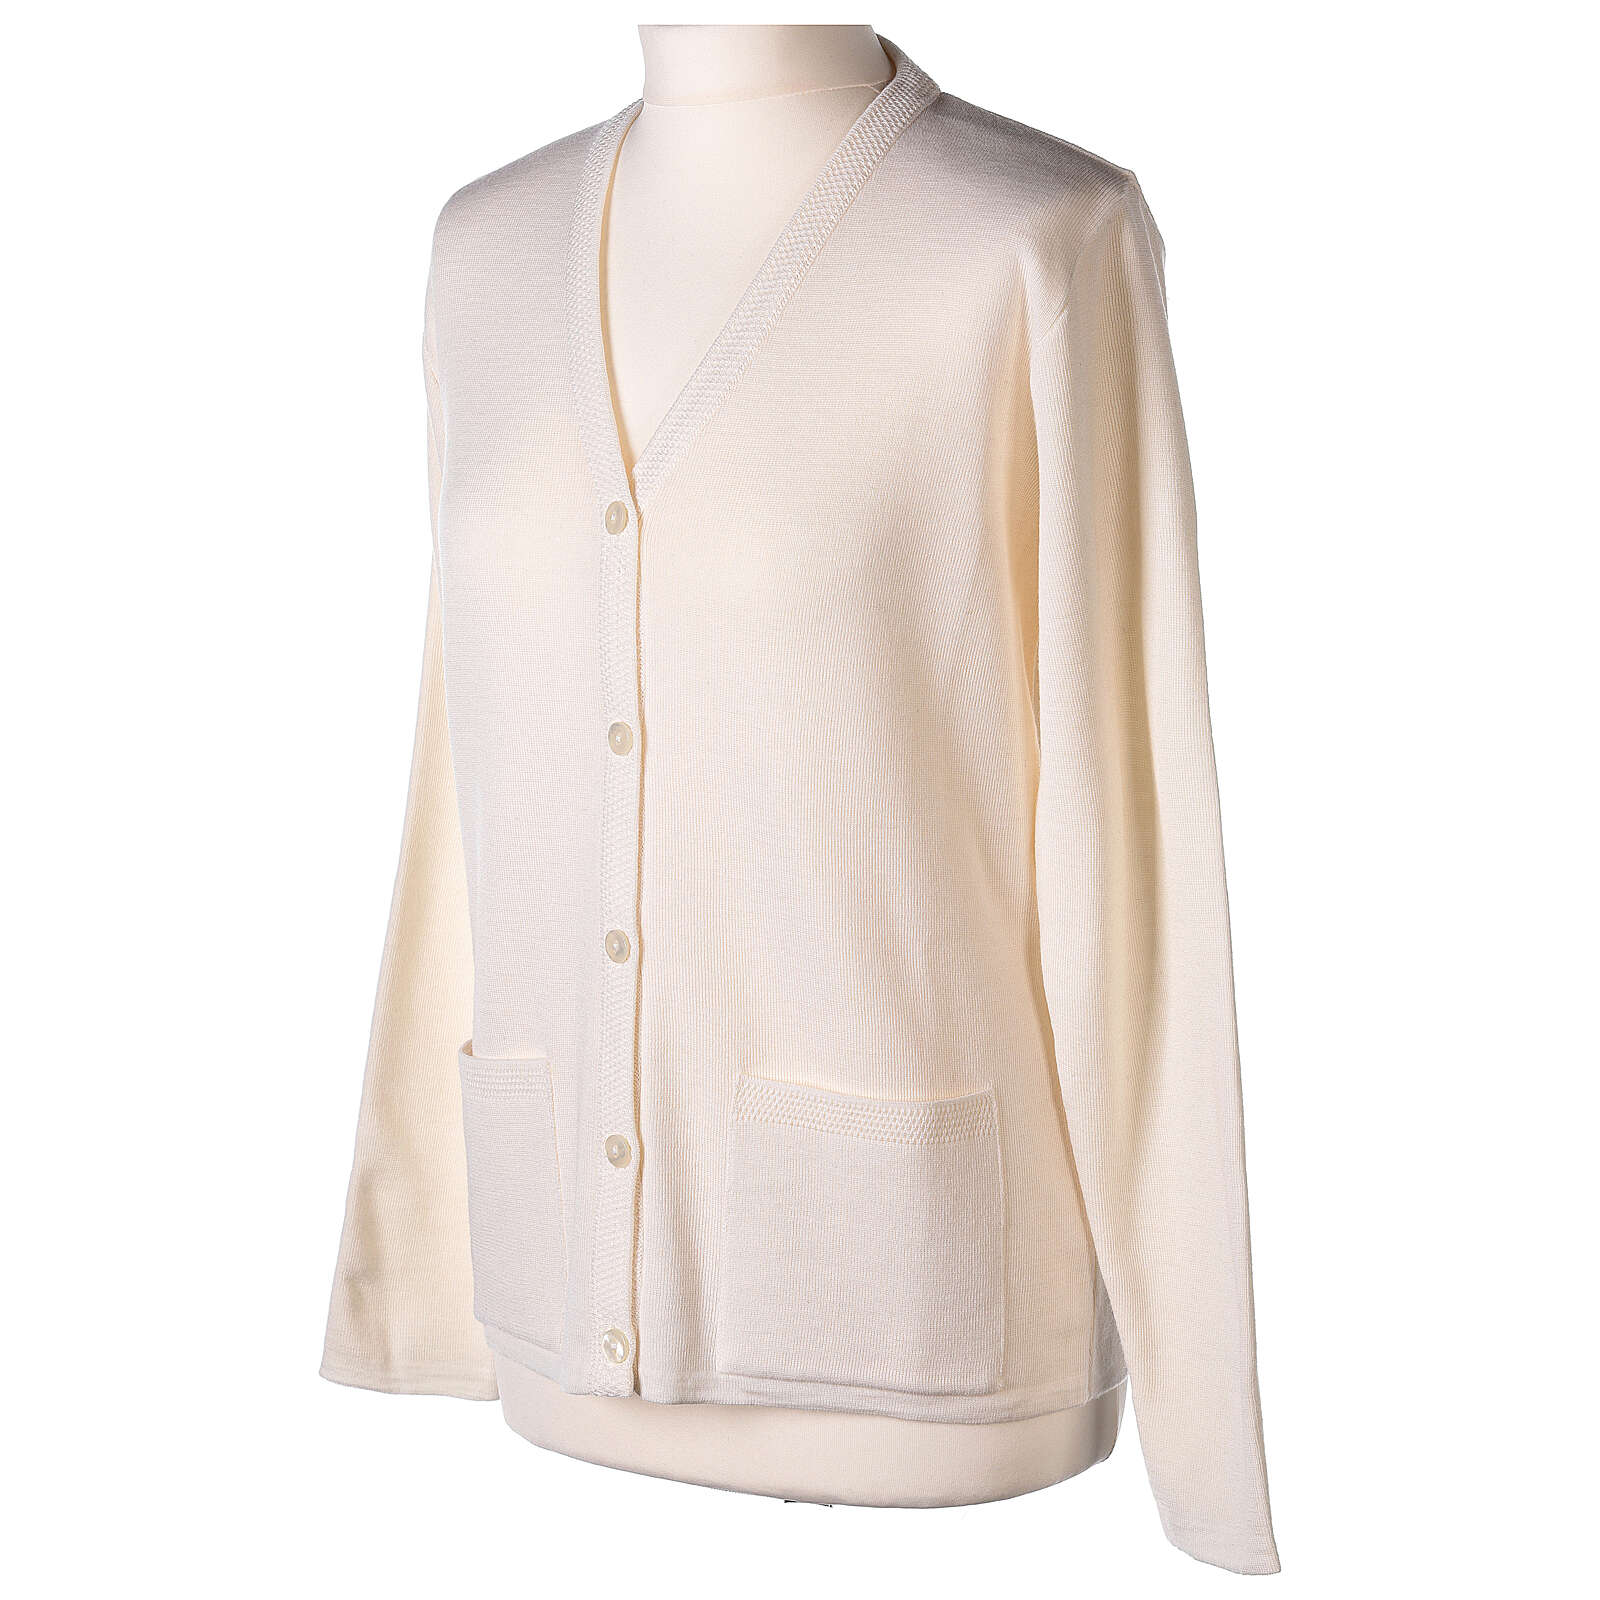 Cardigan pour soeur blanc bcol en V poches GRANDE TAILLE 50% acrylique 50% mérinos In Primis 4